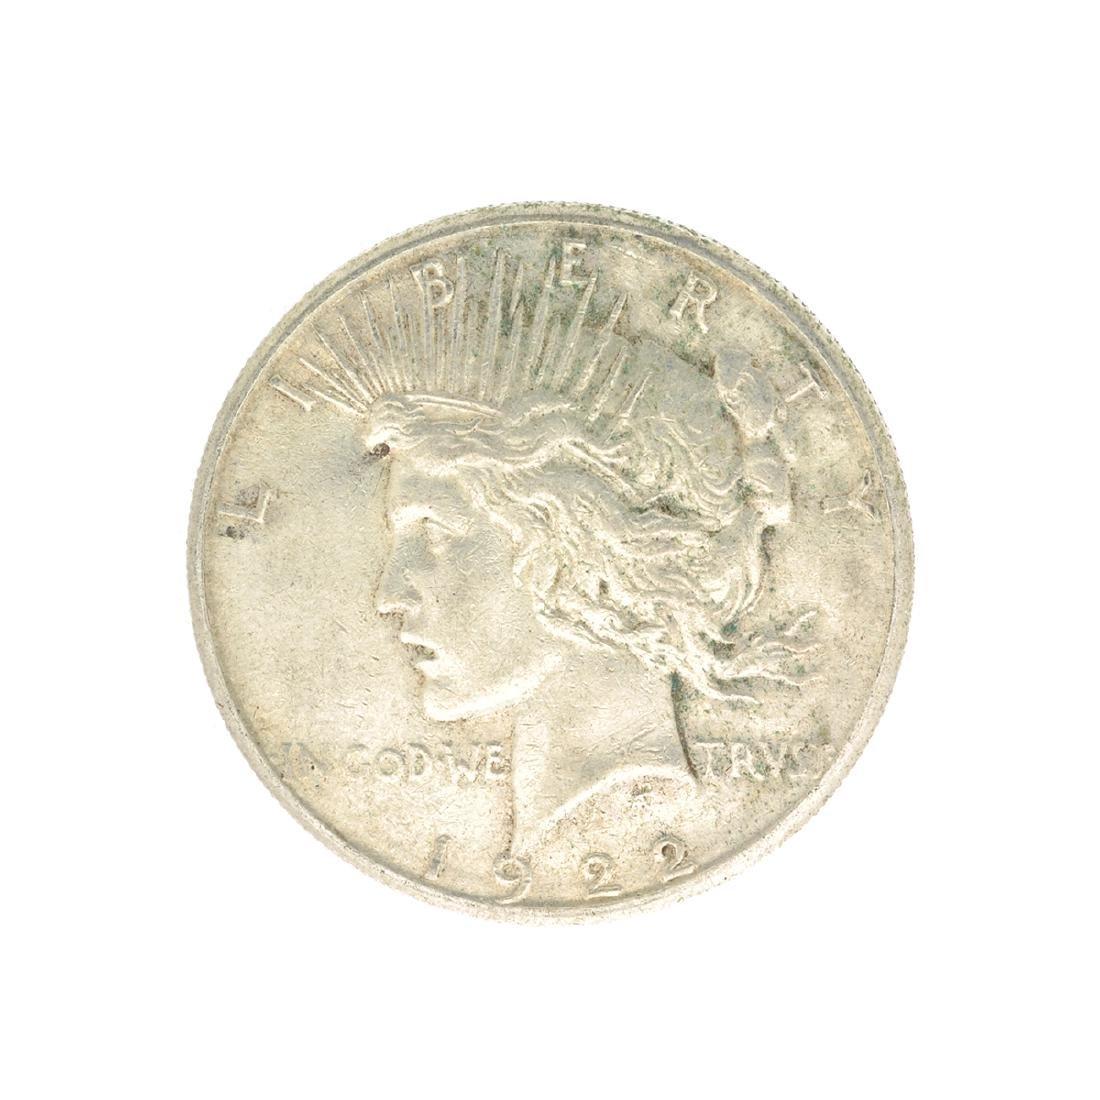 Rare 1922-S U.S. Peace Type Silver Dollar